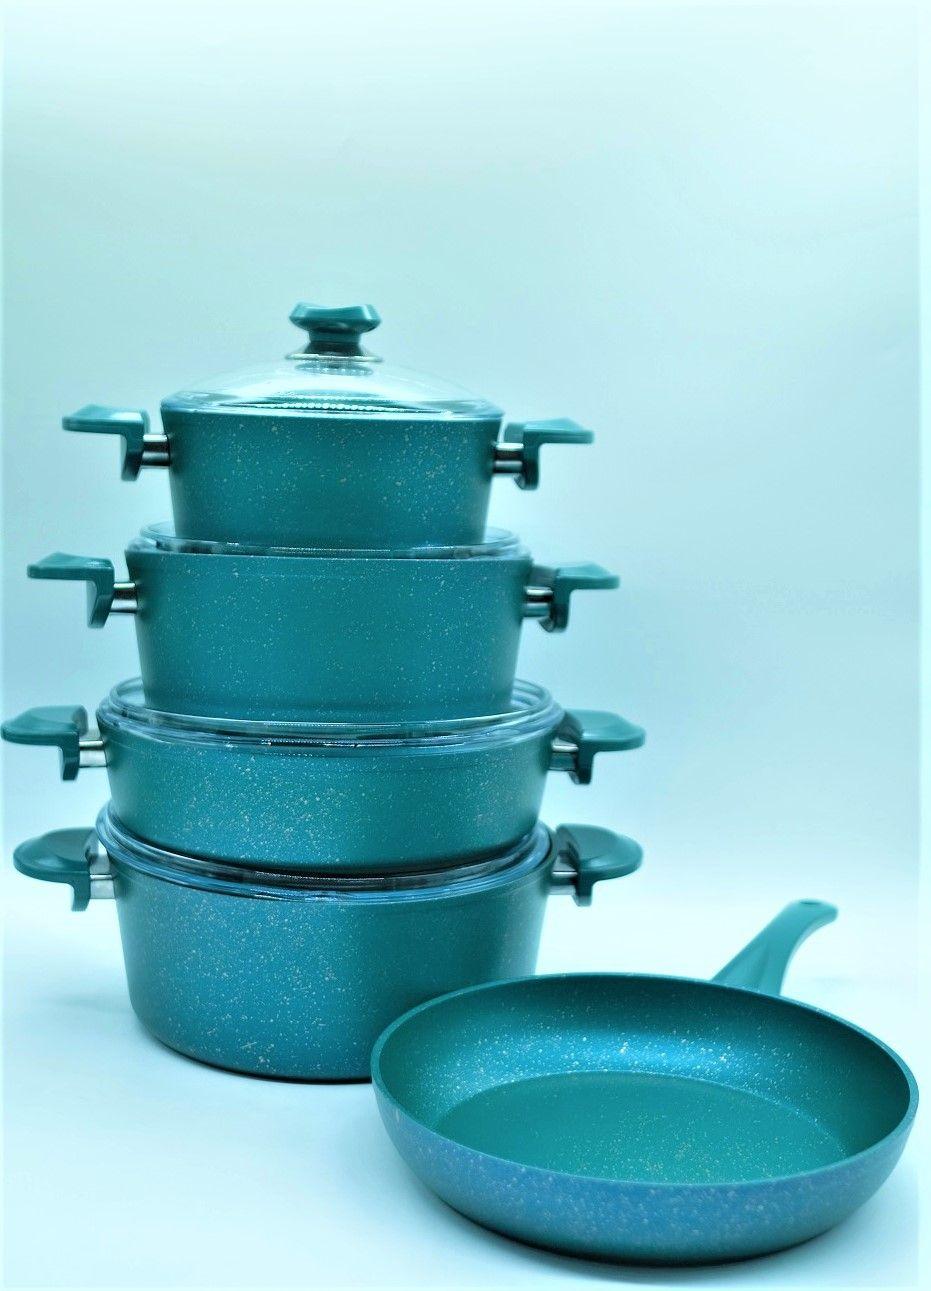 OMS 9 Pcs Mentol Granitec Cookware Set - Made in Turkey